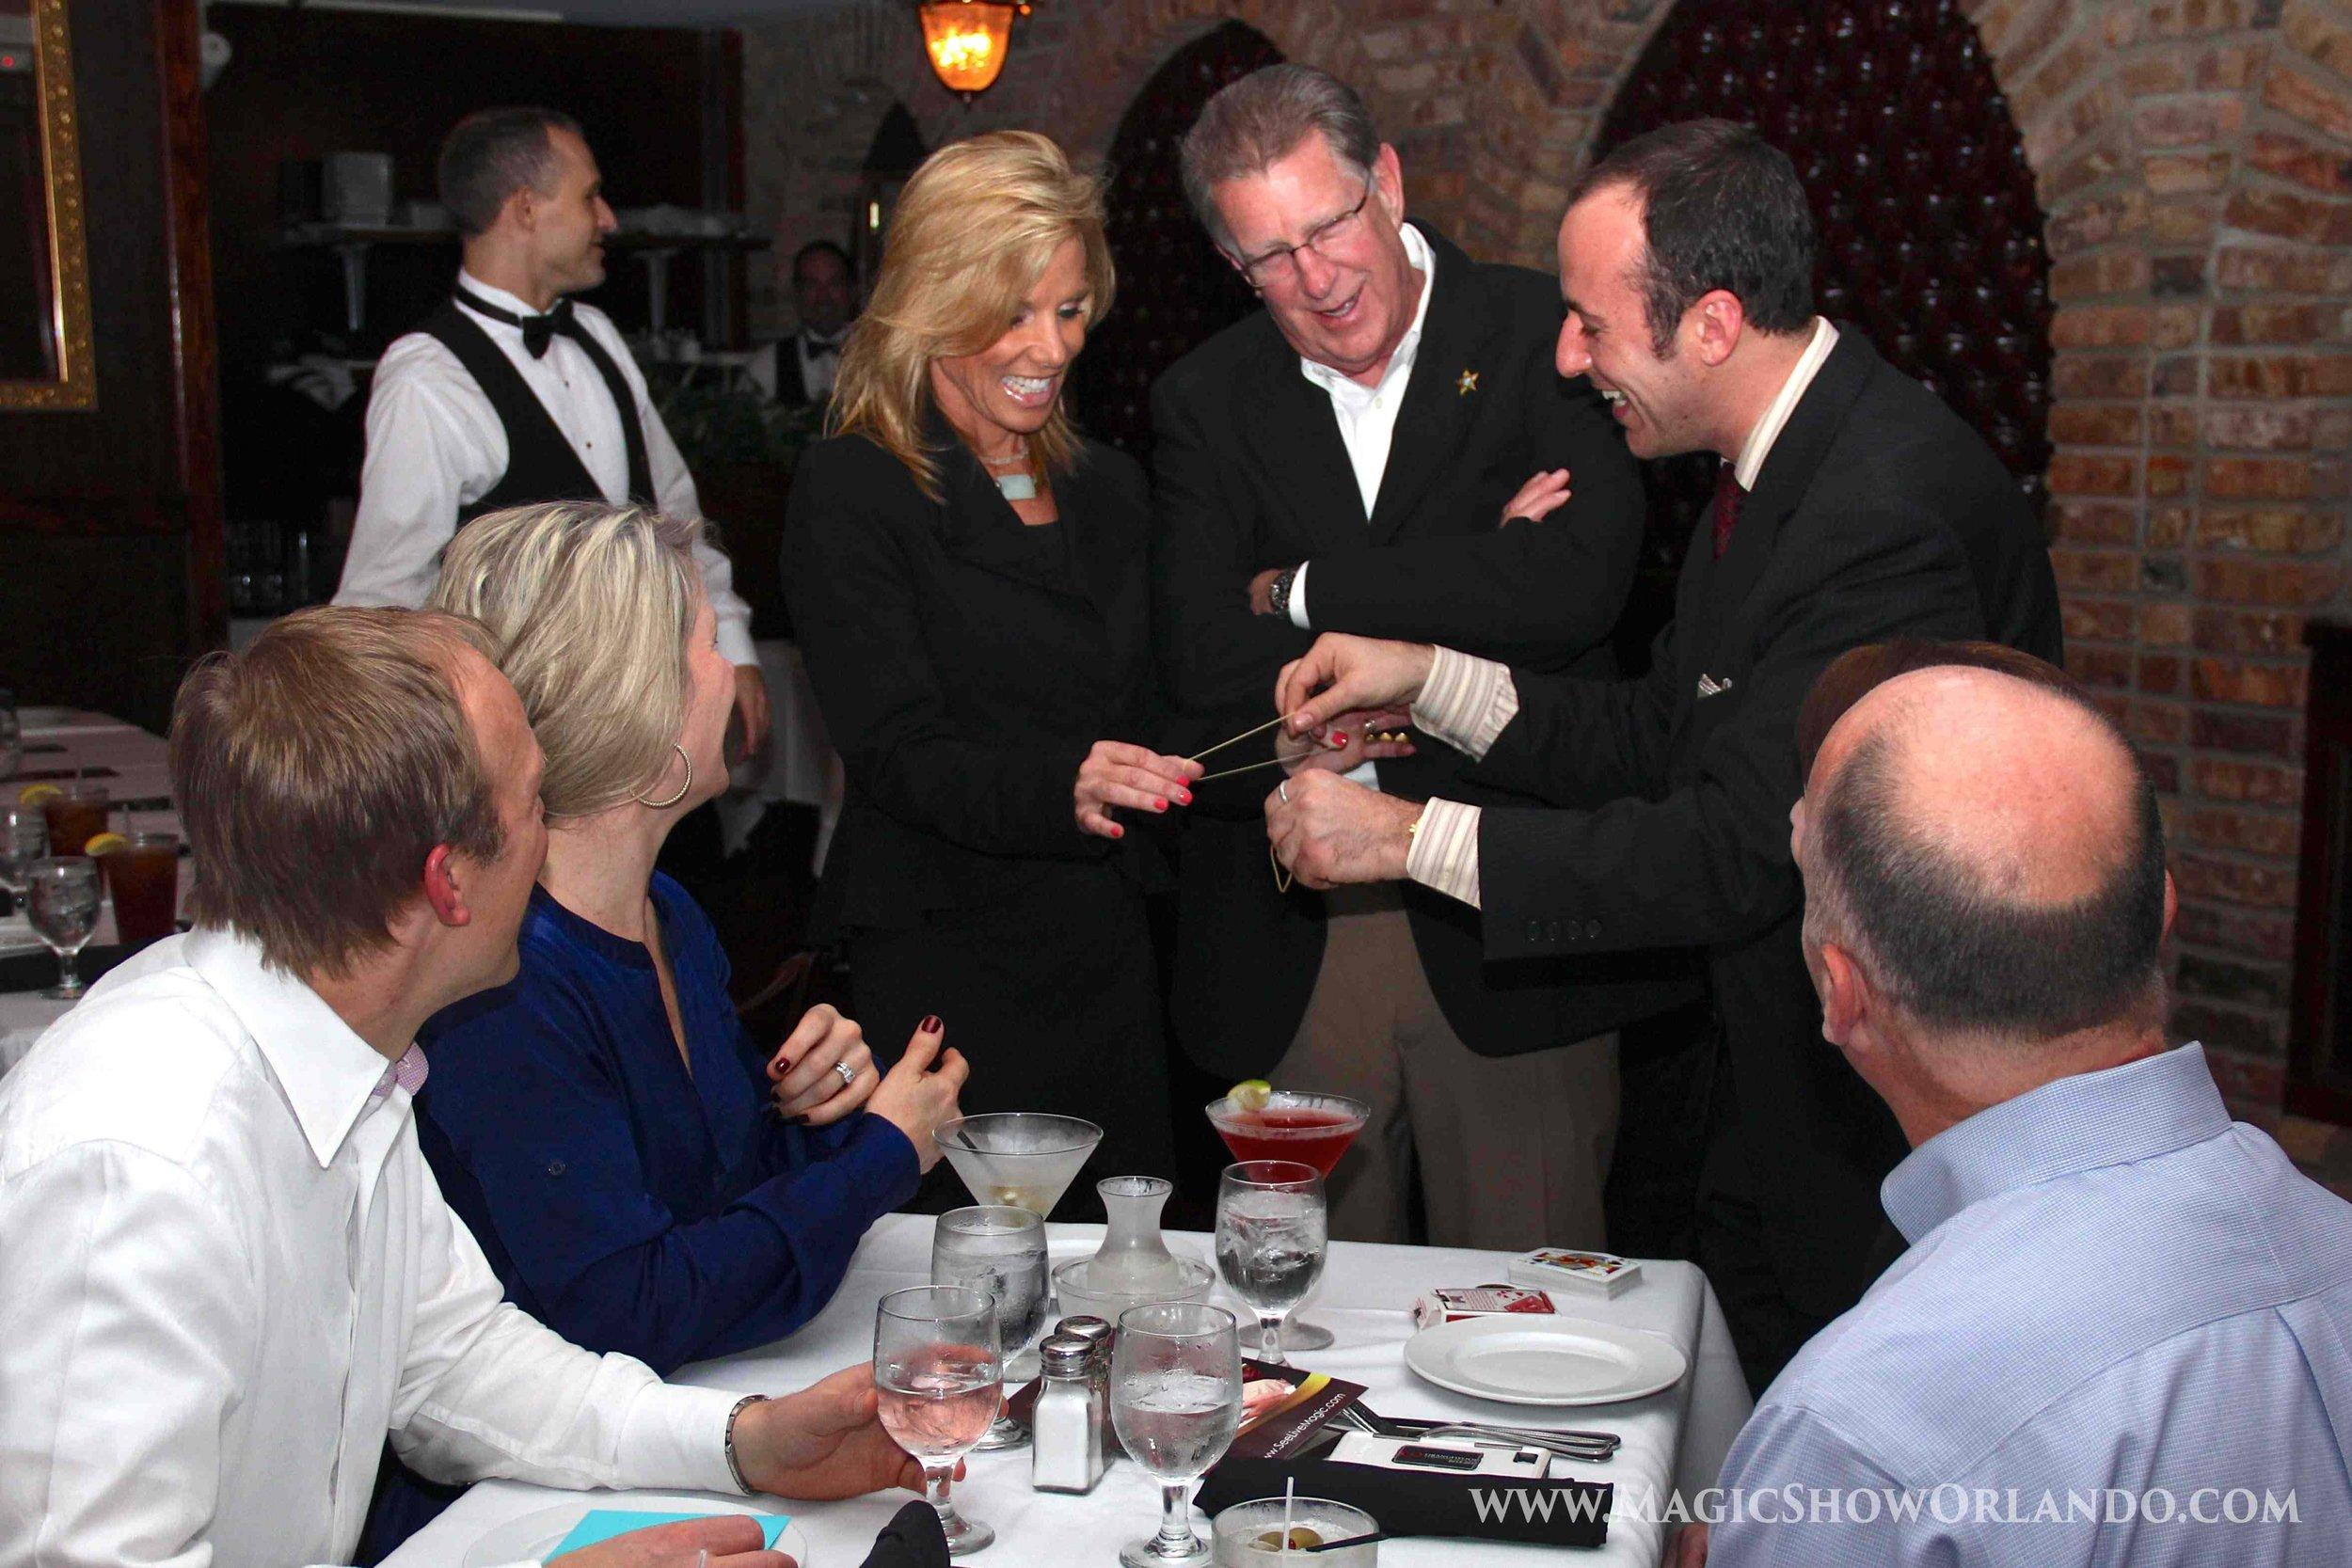 Orlando Magician Kostya Kimlat Close Up Entertainer Dinner Show.jpg